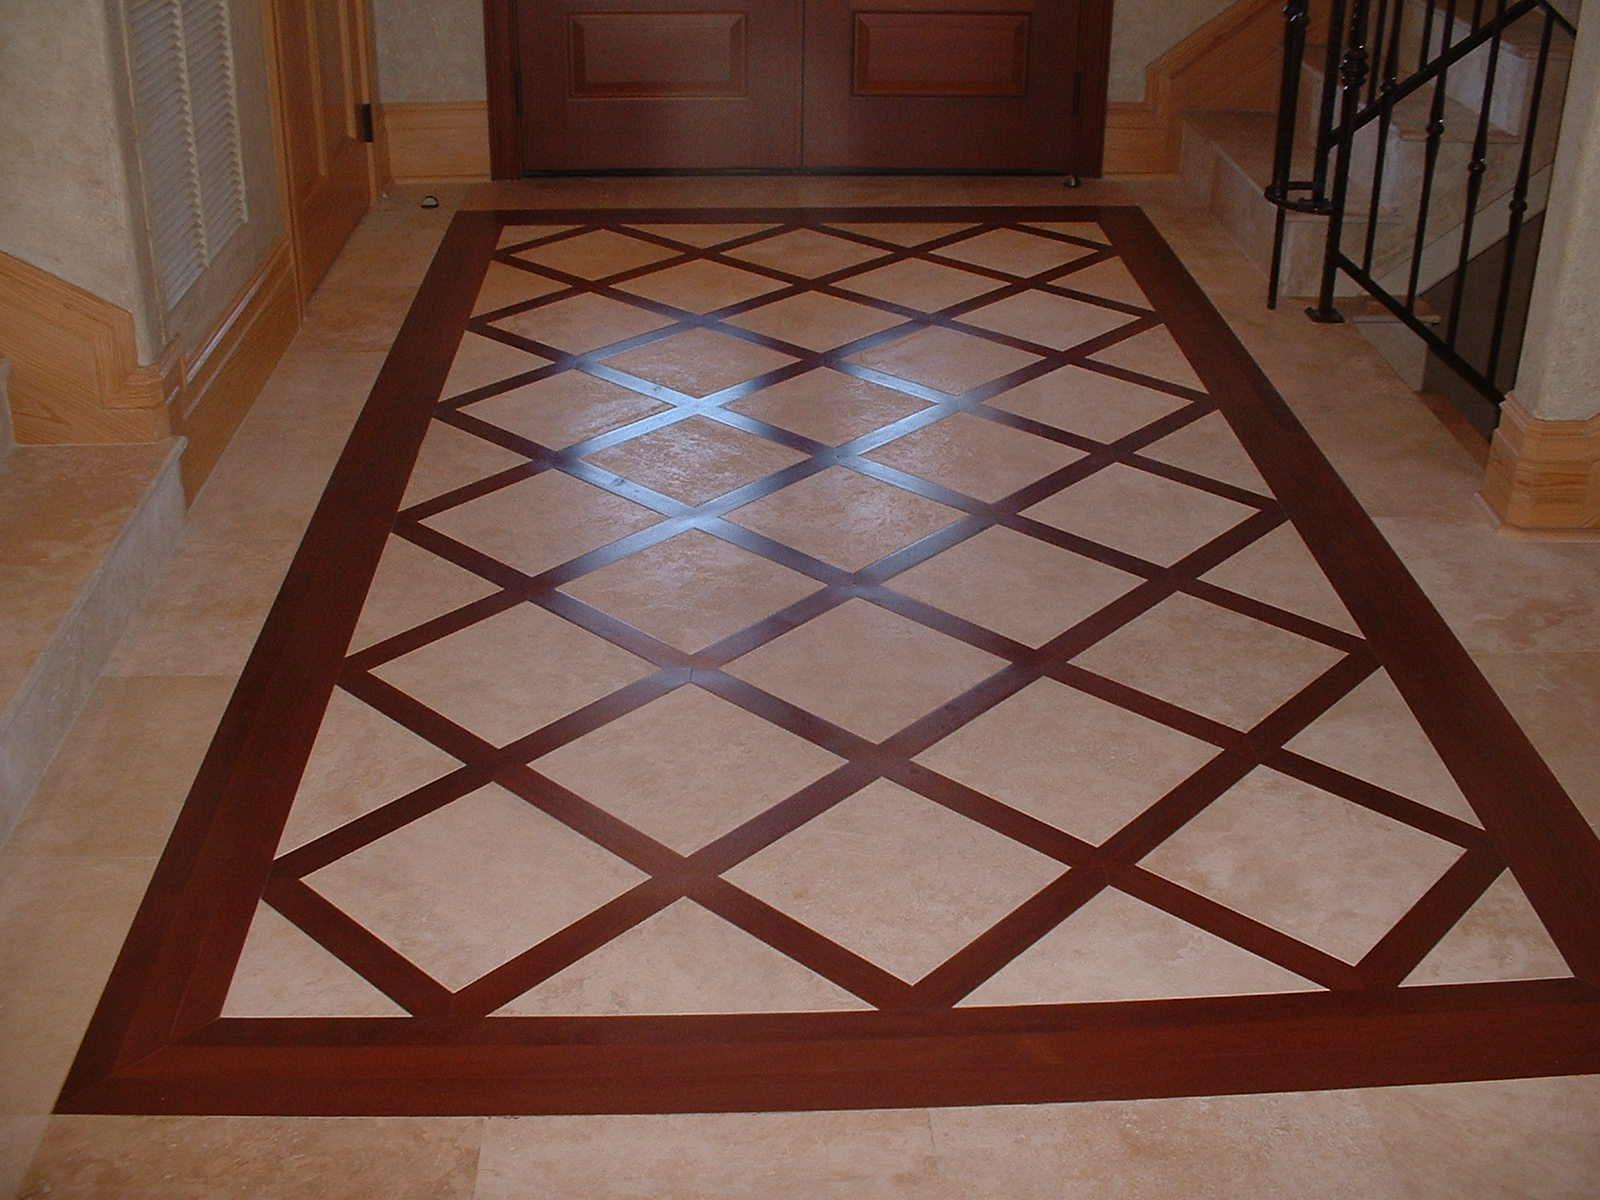 Home Flooring Ideas Beautiful Wood Flooring Interior Floor. Home floor design